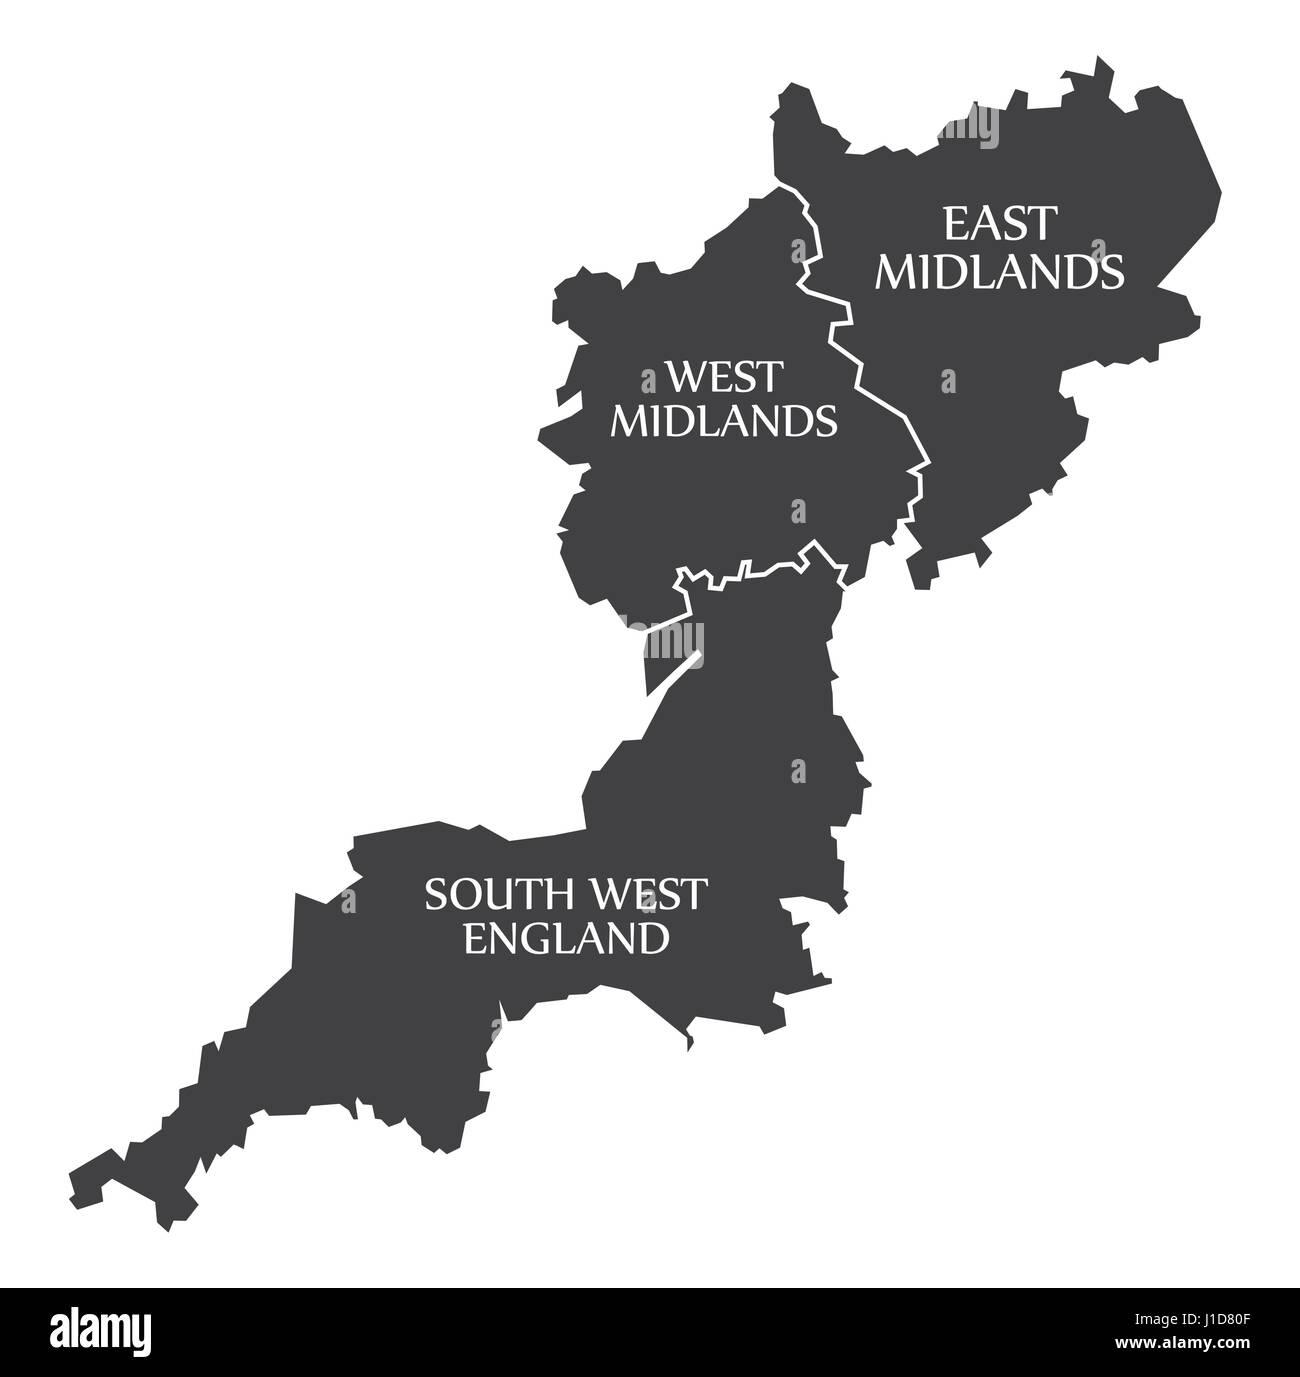 South West England  West Midlands  East Midlands Map UK Stock